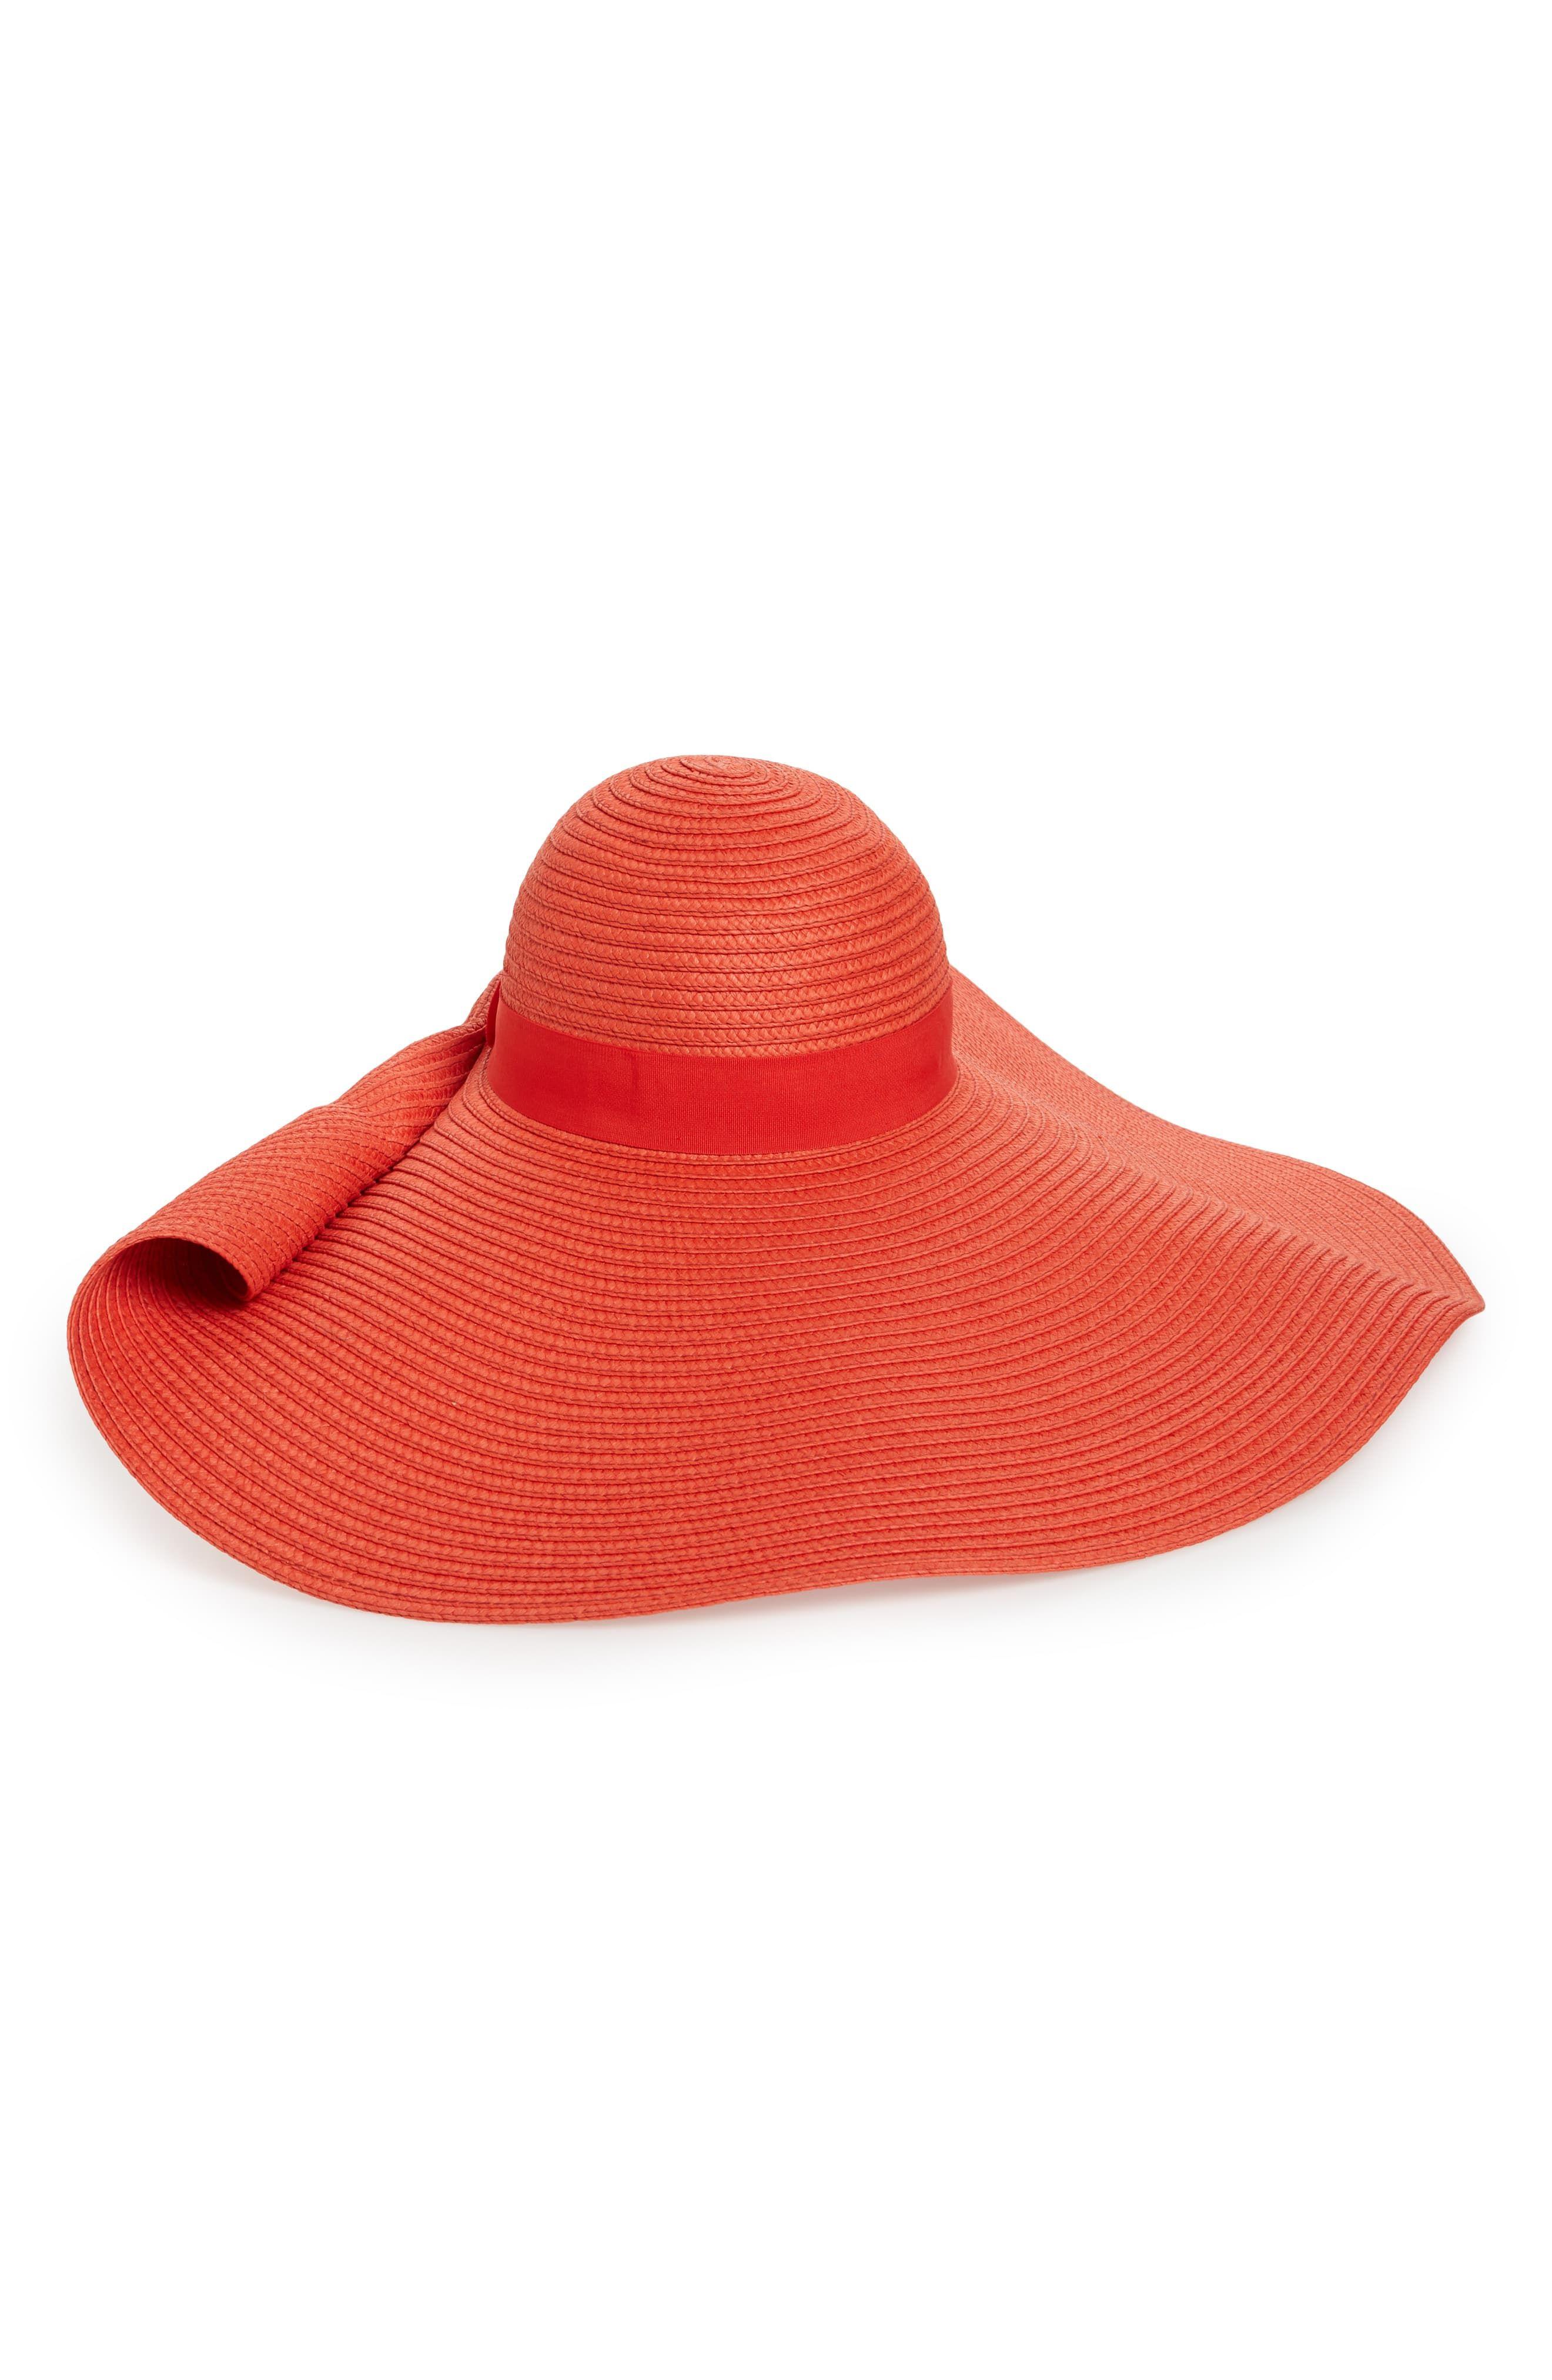 493c224089c8 25 Best Sun Hats for Summer 2019 - Floppy, Woven Straw, More